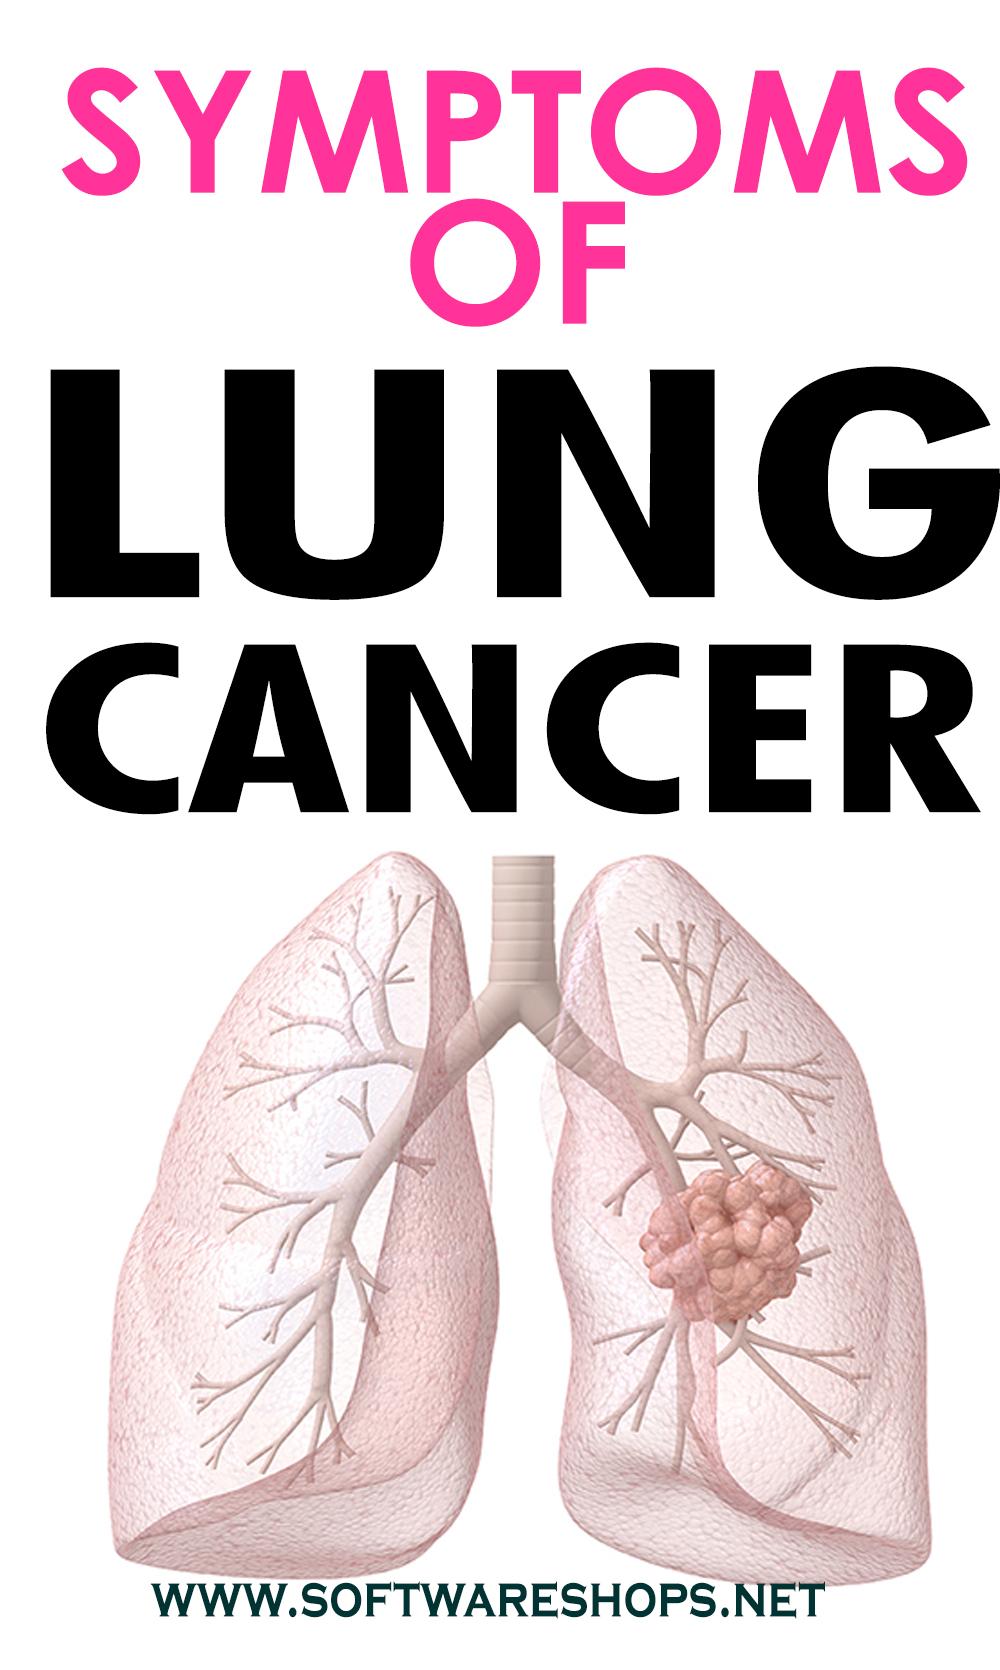 LUNGS CANCER SYMPTOMS IN FEMALE